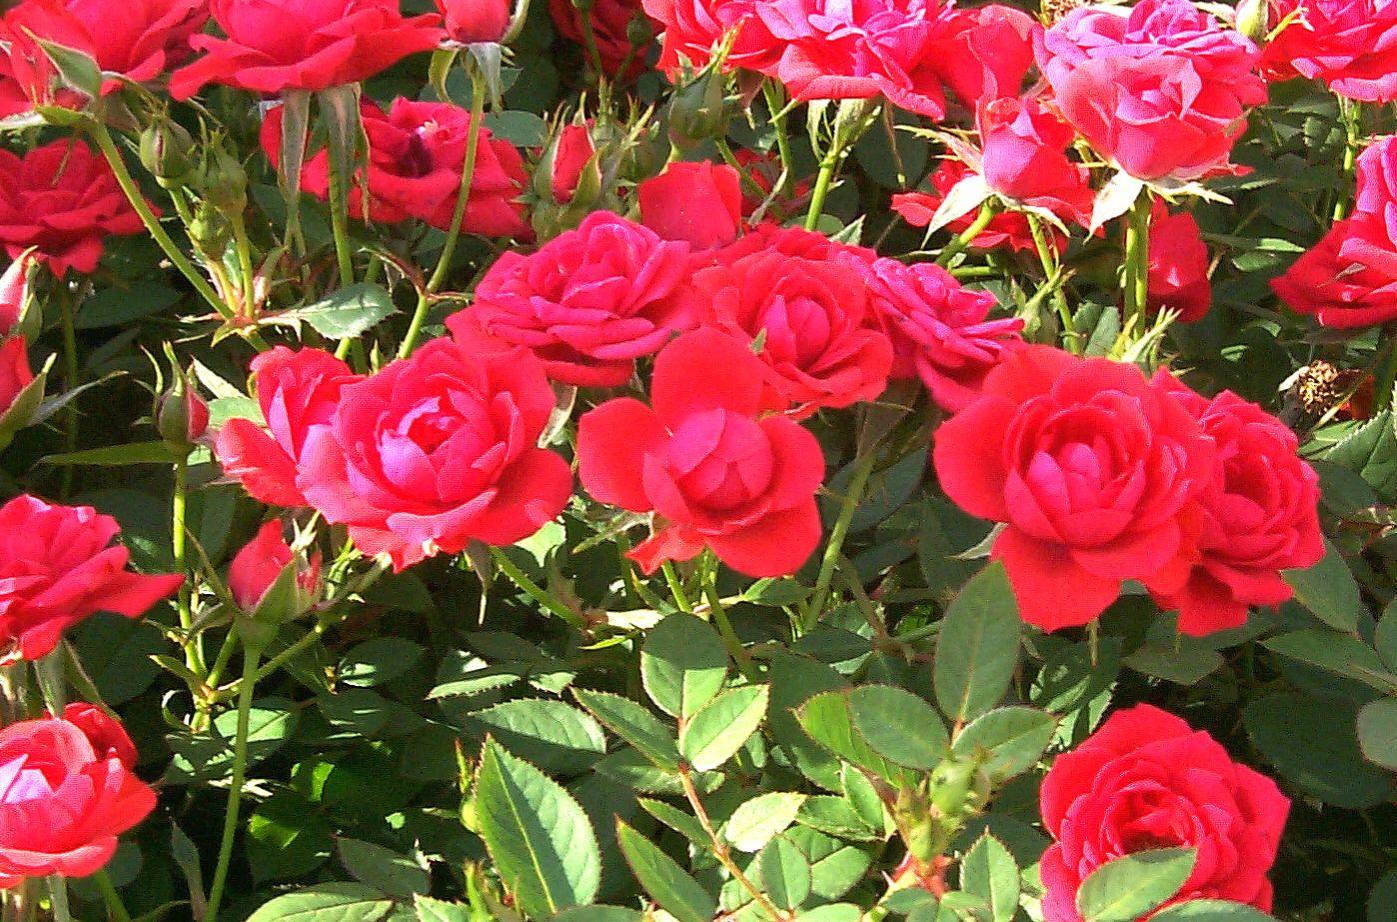 banana-peel-uses-rose-fertilizer